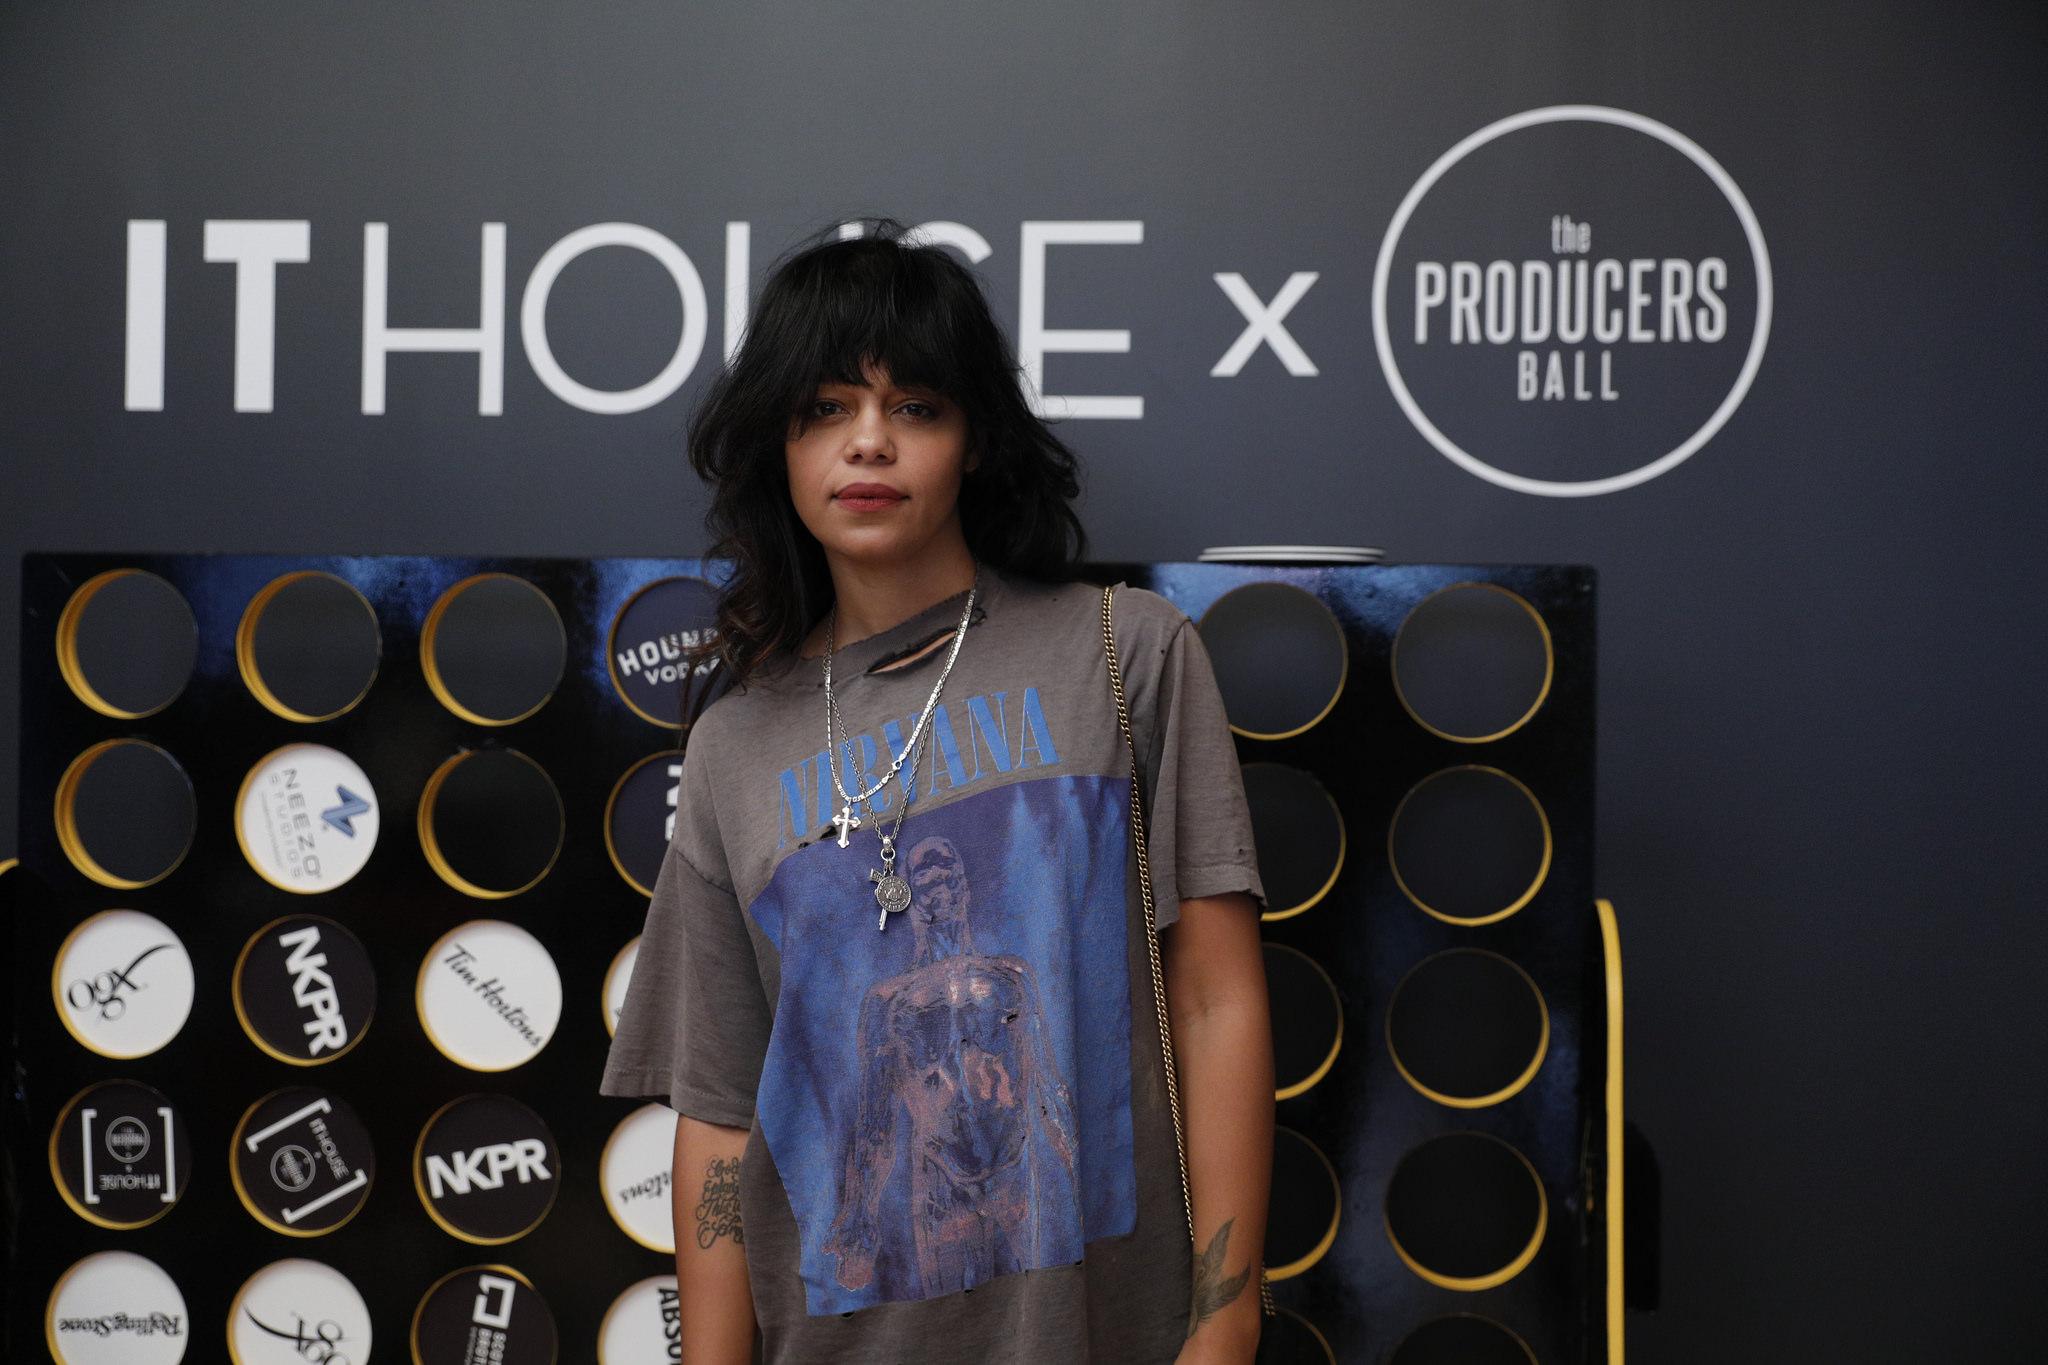 Park Creative Agency - Fefe Dobson - Toronto International Film Festival Event - Producers Ball 2018.jpg